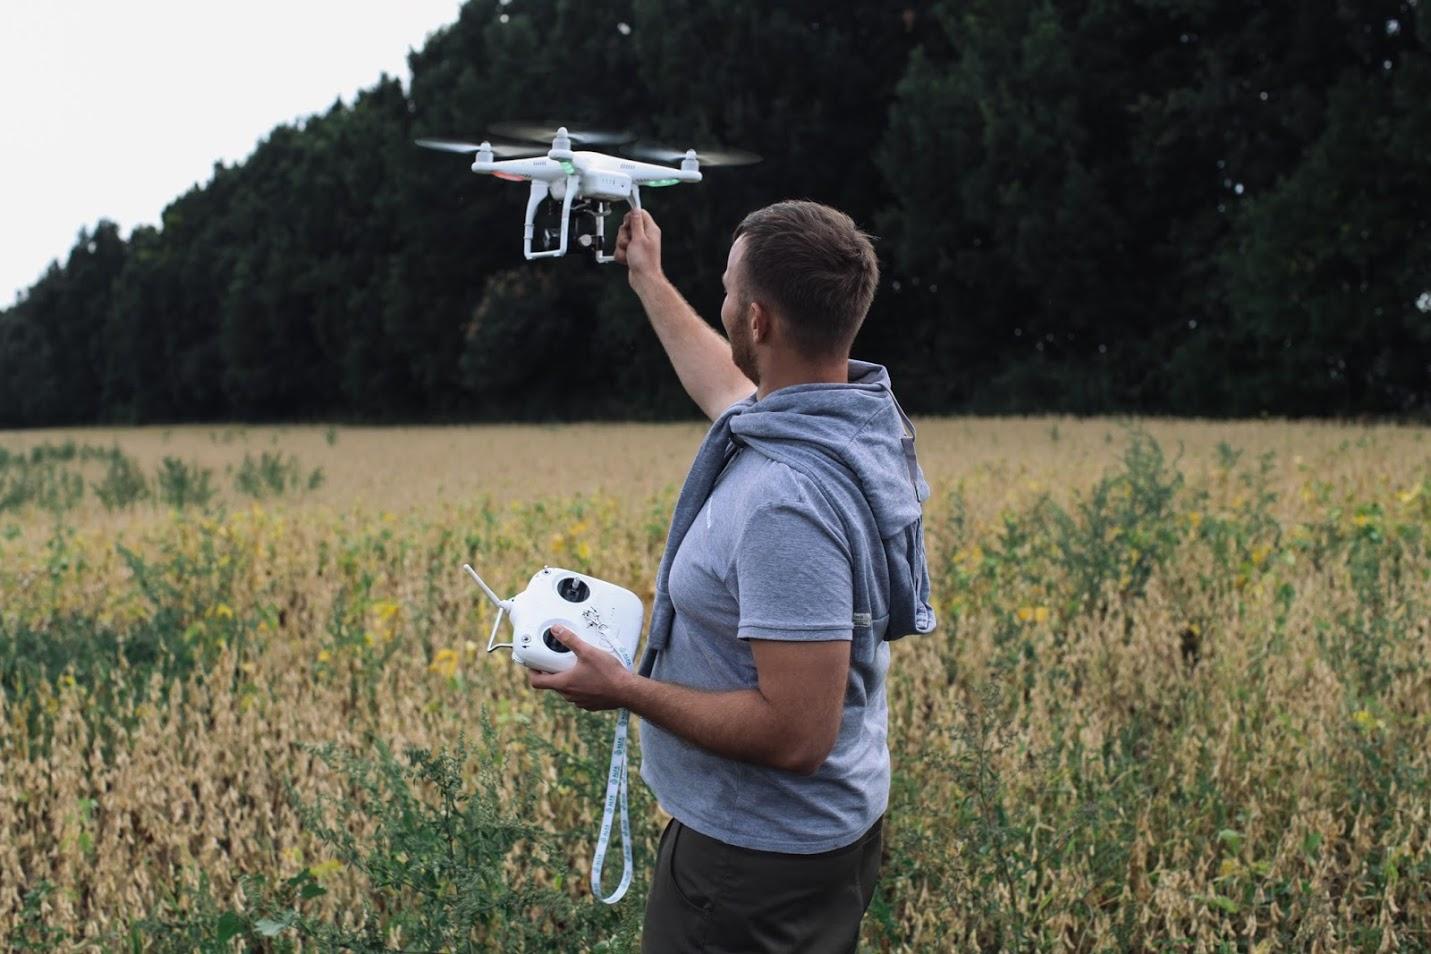 dron-2.jpg (223 KB)